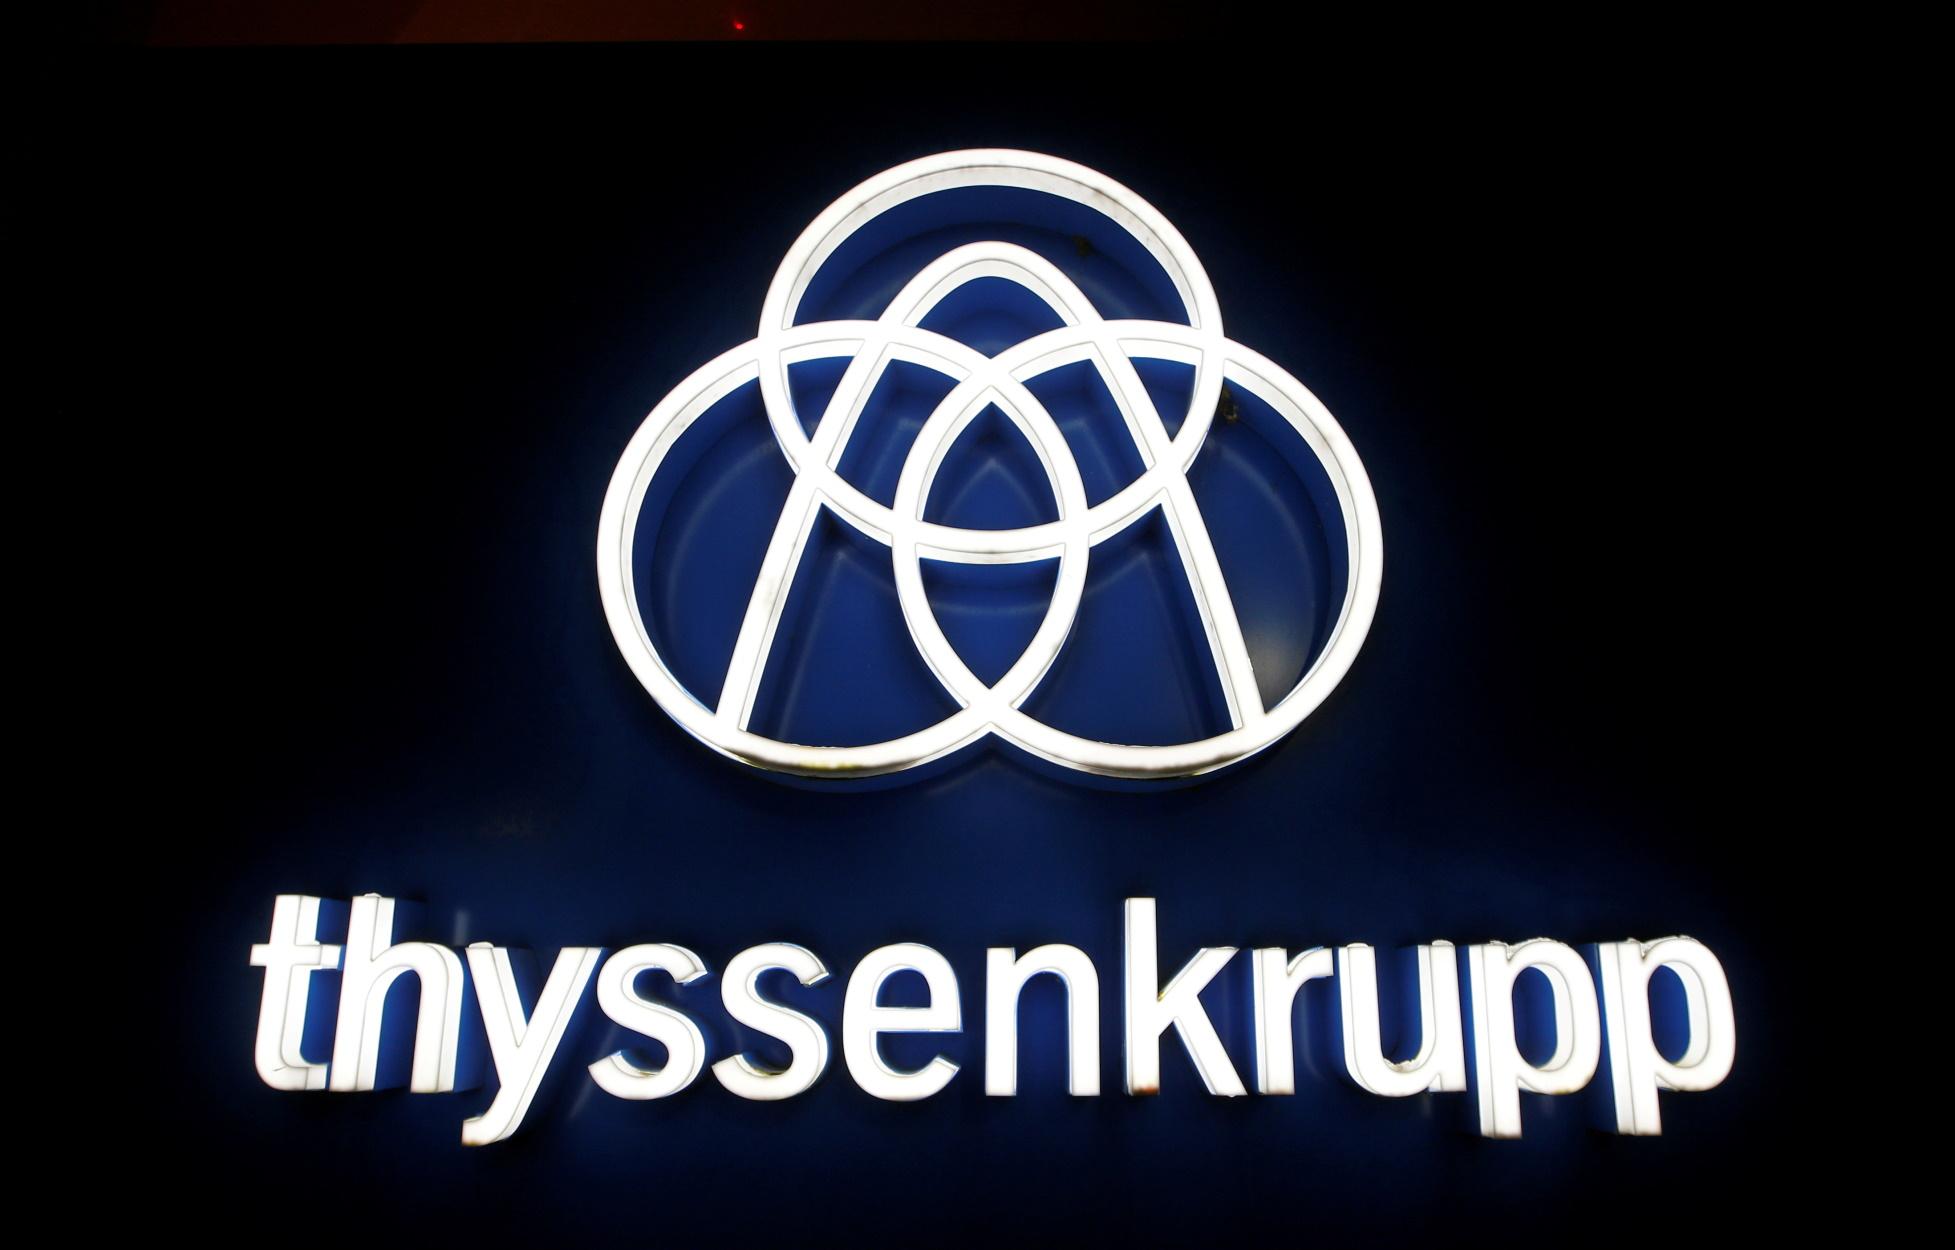 Thyssenkrupp: Σχέδια πώλησης του ιστορικού βιομηχανικού κολοσσού της Γερμανίας